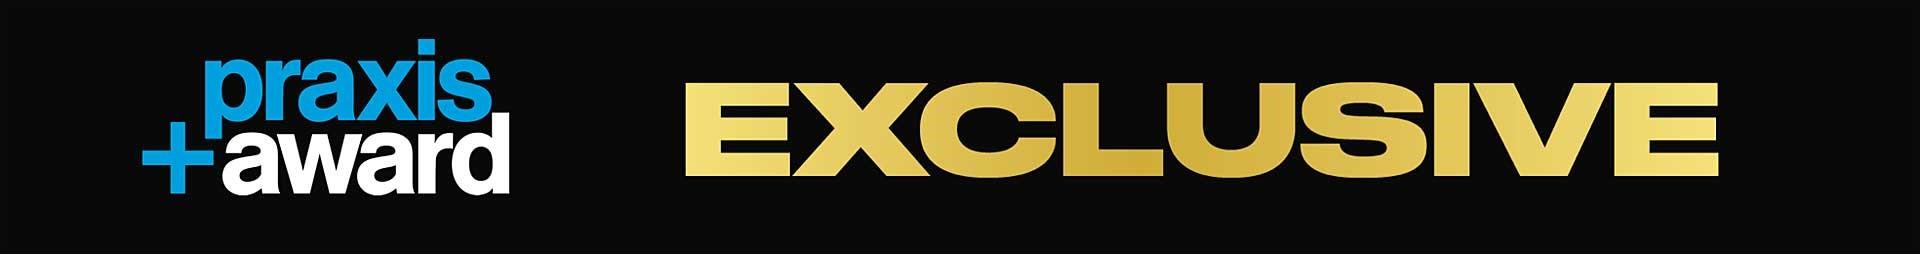 2021: EXKLUSIVER TELEFON EXPERTEN-SERVICE / Praxis+Award Qualitätssiegel